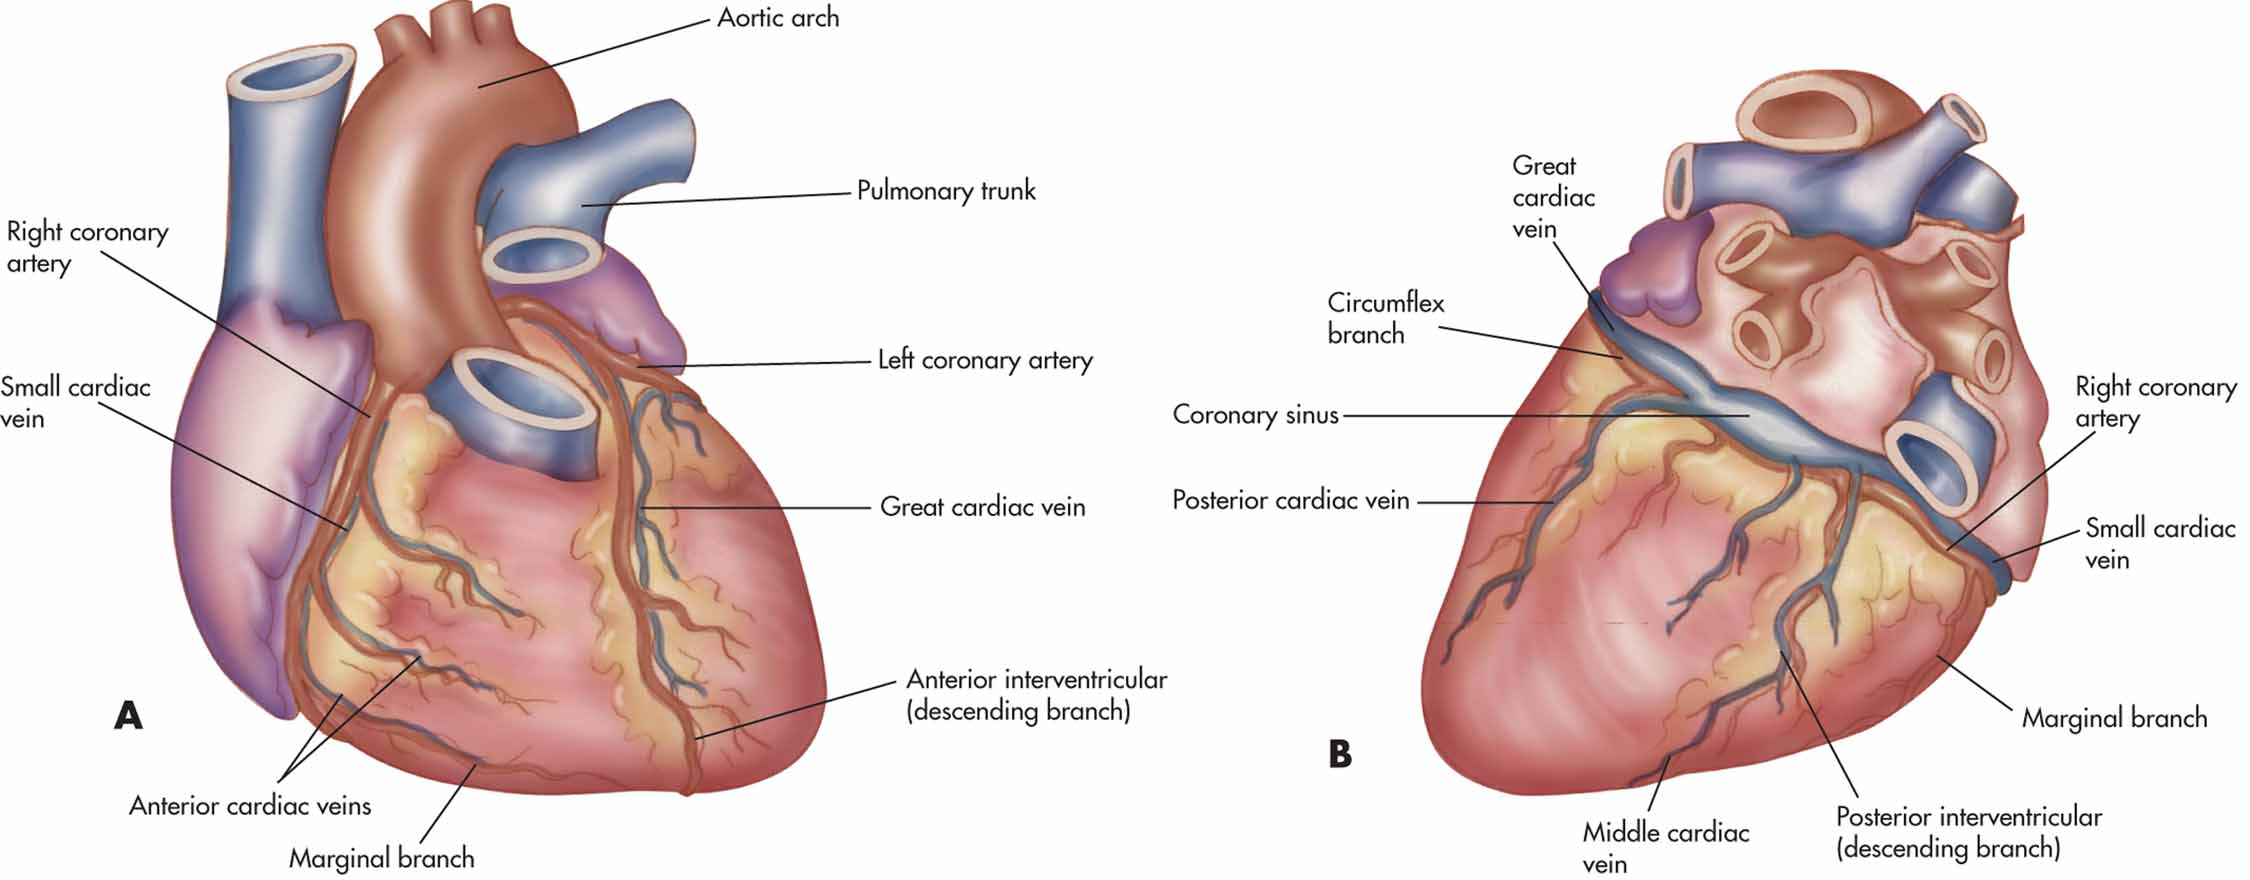 coronary anatomy diagram nissan navara d40 central locking wiring circulation